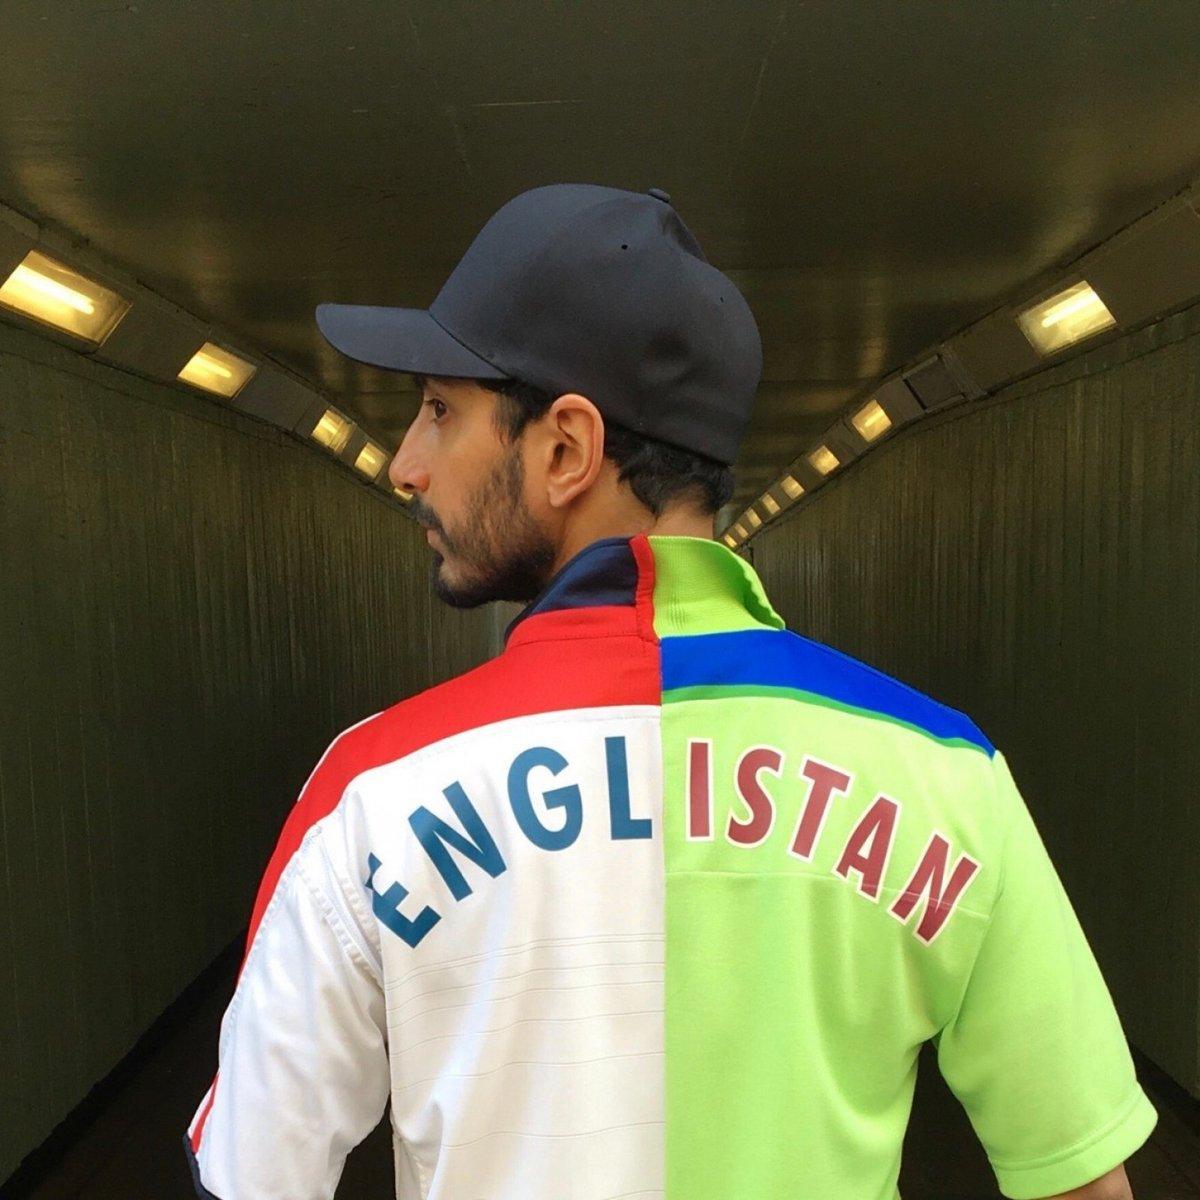 English Pakistani: The true spirit of cricket supporter Cricket,Pakistan,England,T20I,supporter,uniform,T-Shirt